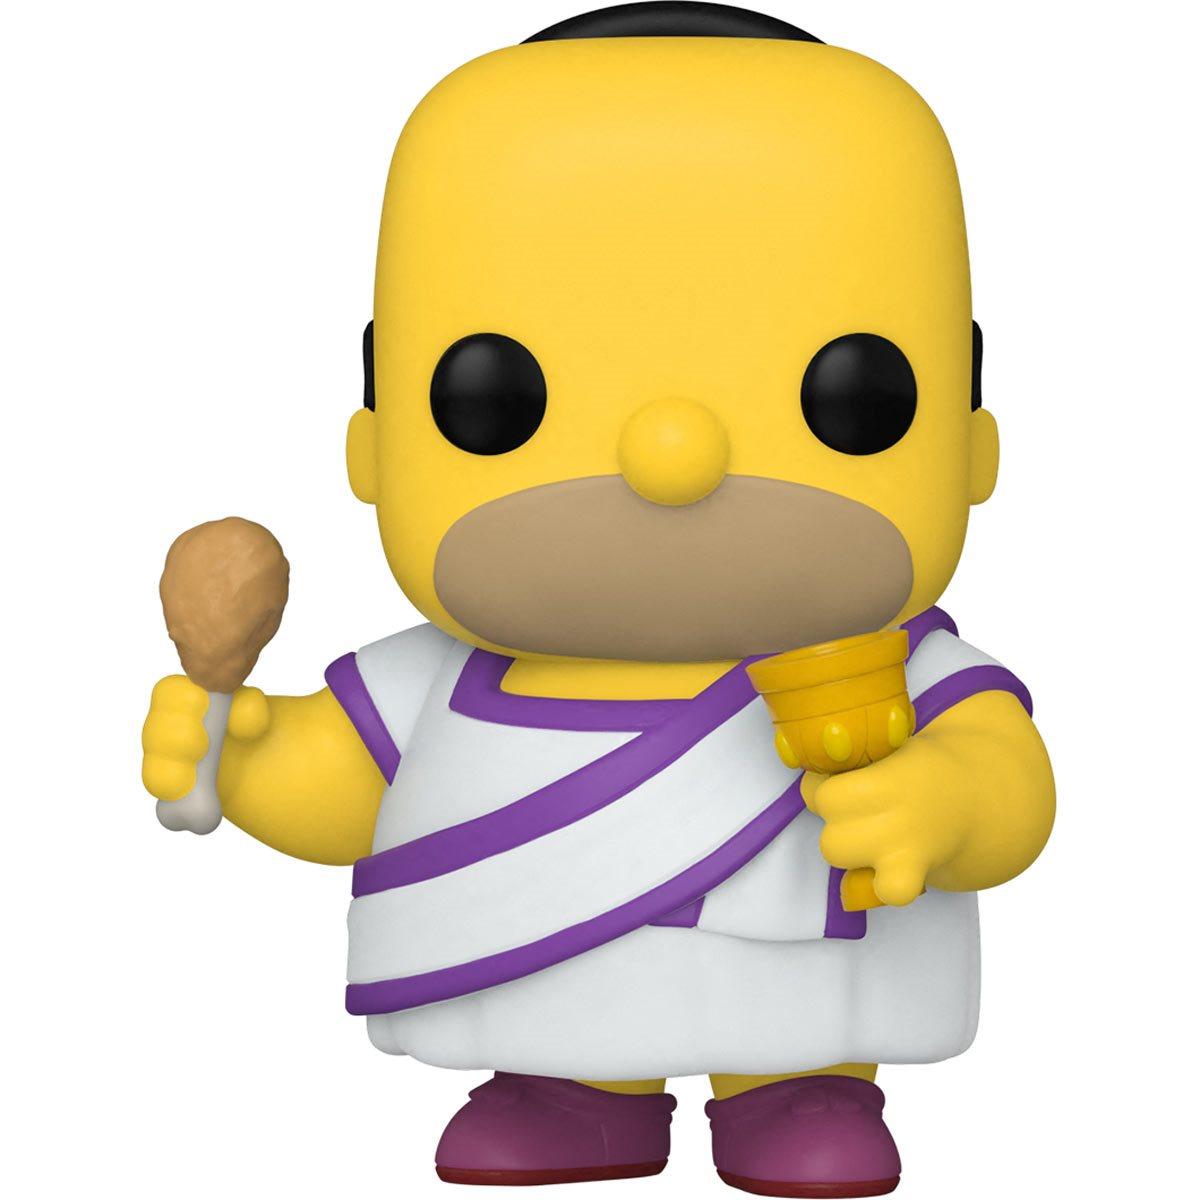 PRÉ VENDA: Funko Pop! Obeseus Homer: Os Simpsons - Funko